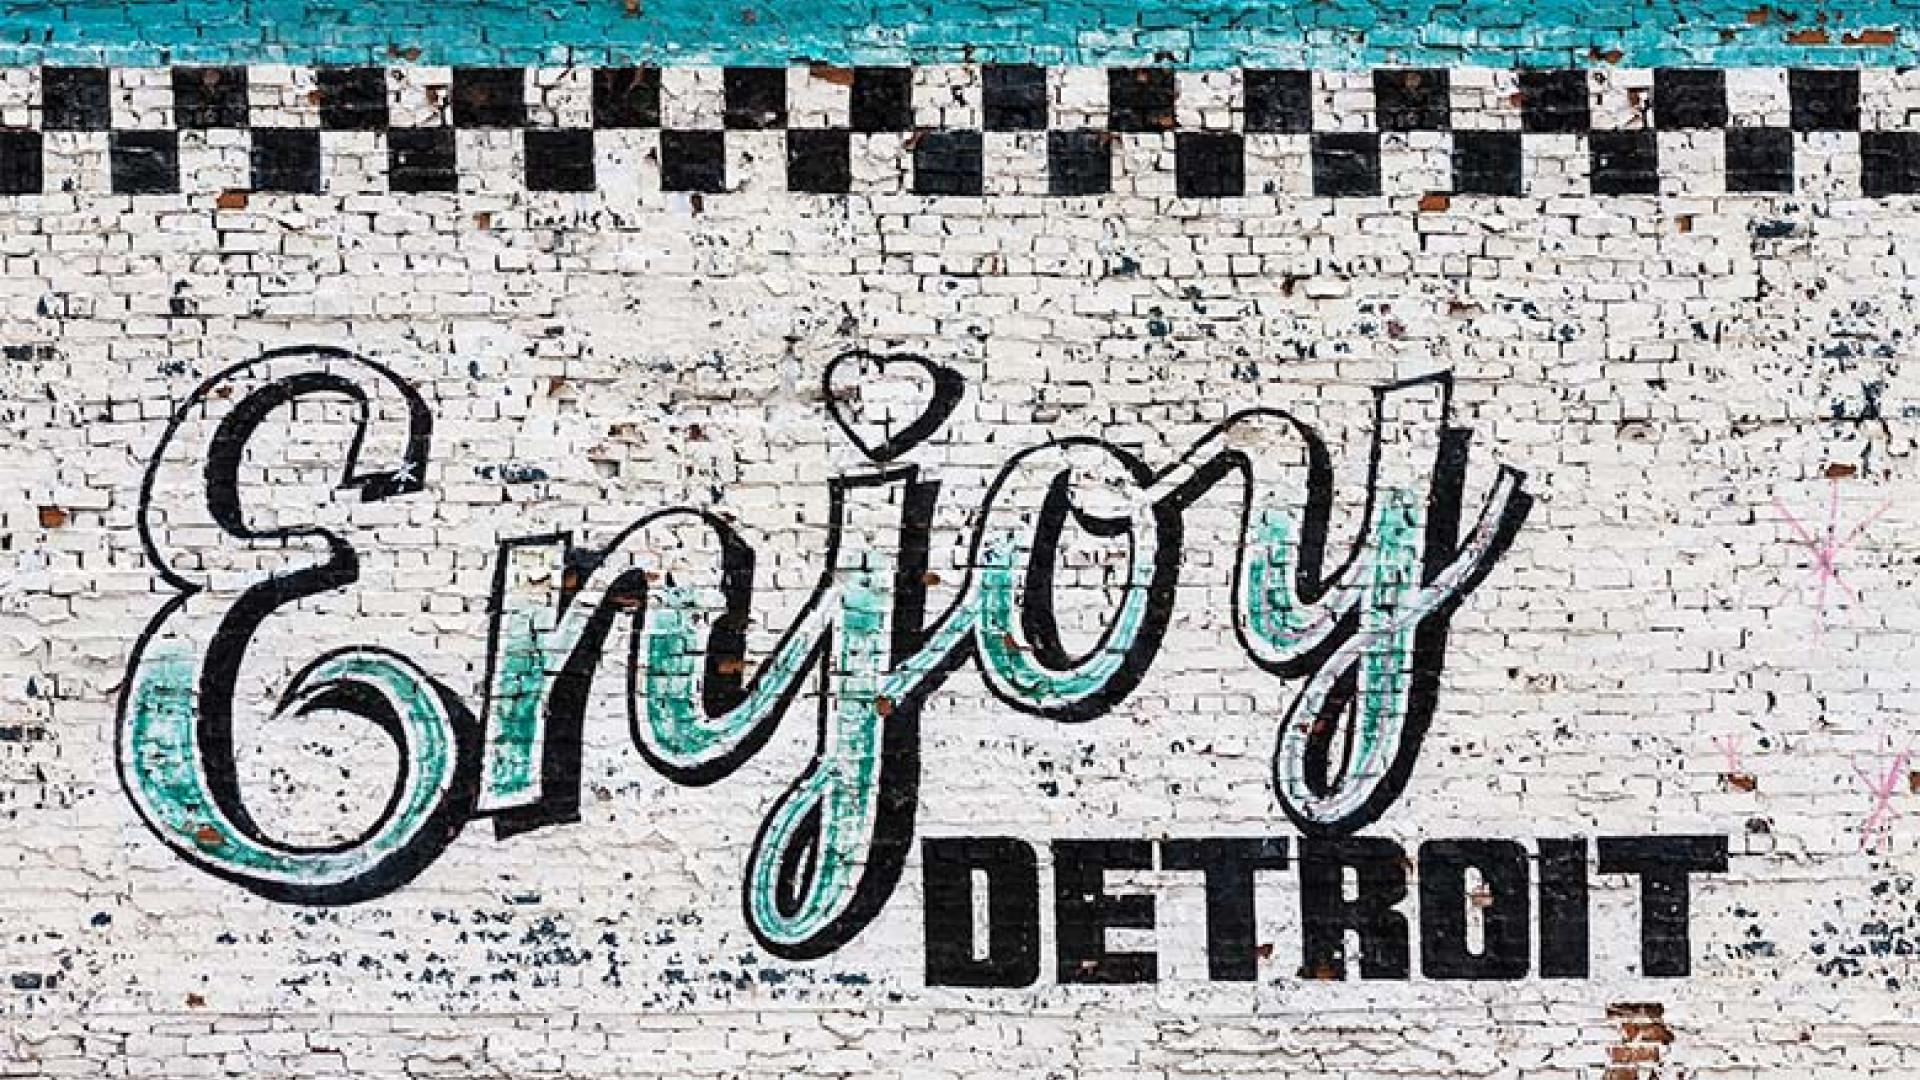 Enjoy Detroit mural